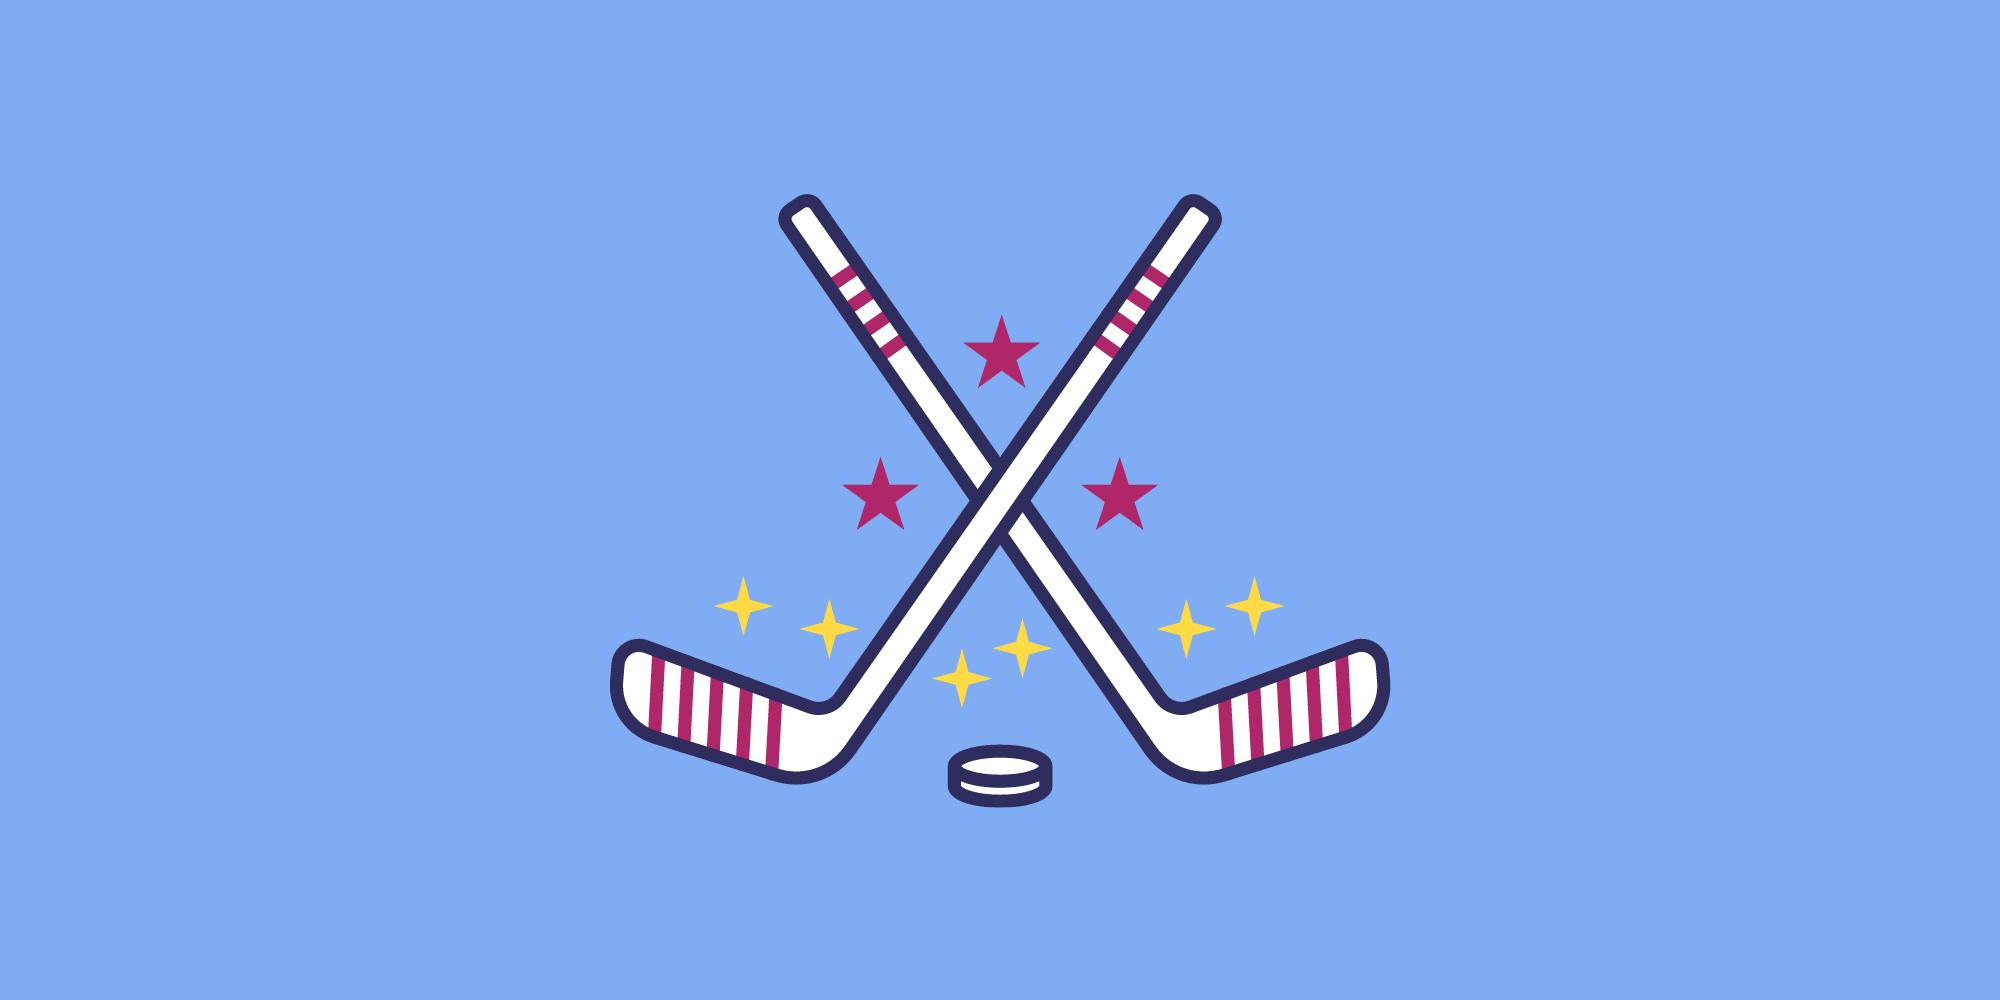 hockey-gifts